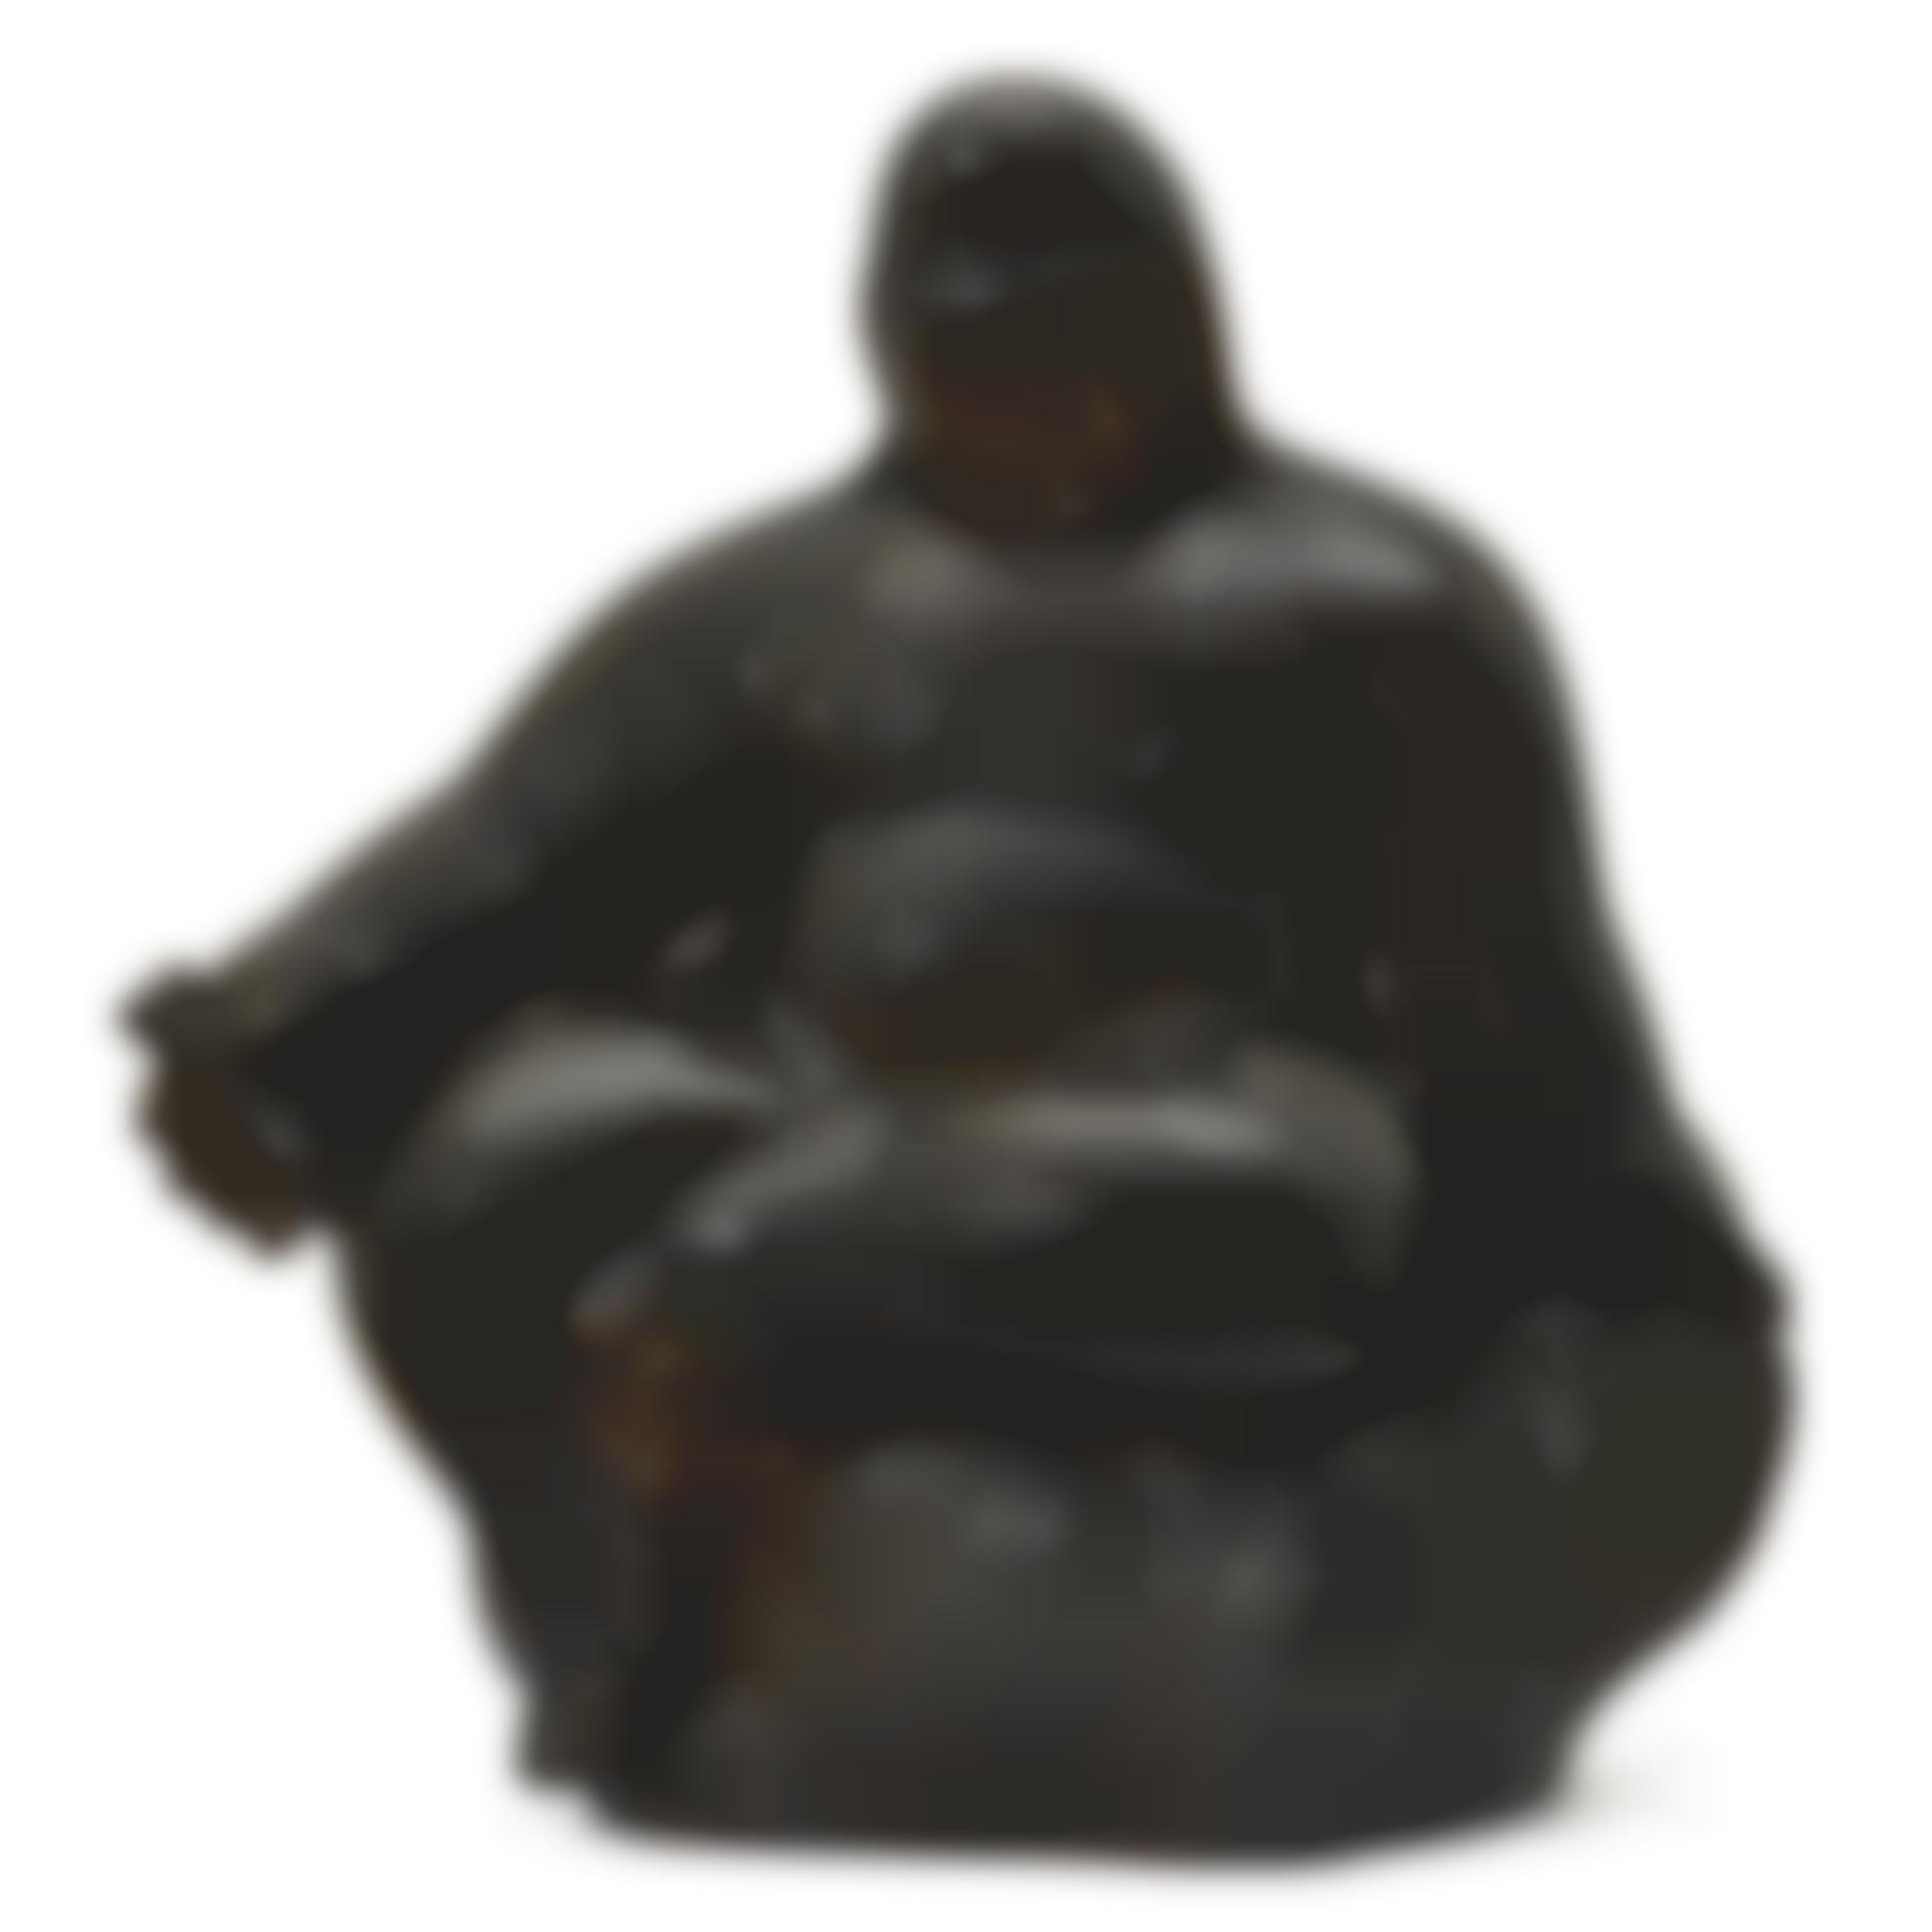 Li Chen-Avalokitesvara-1998